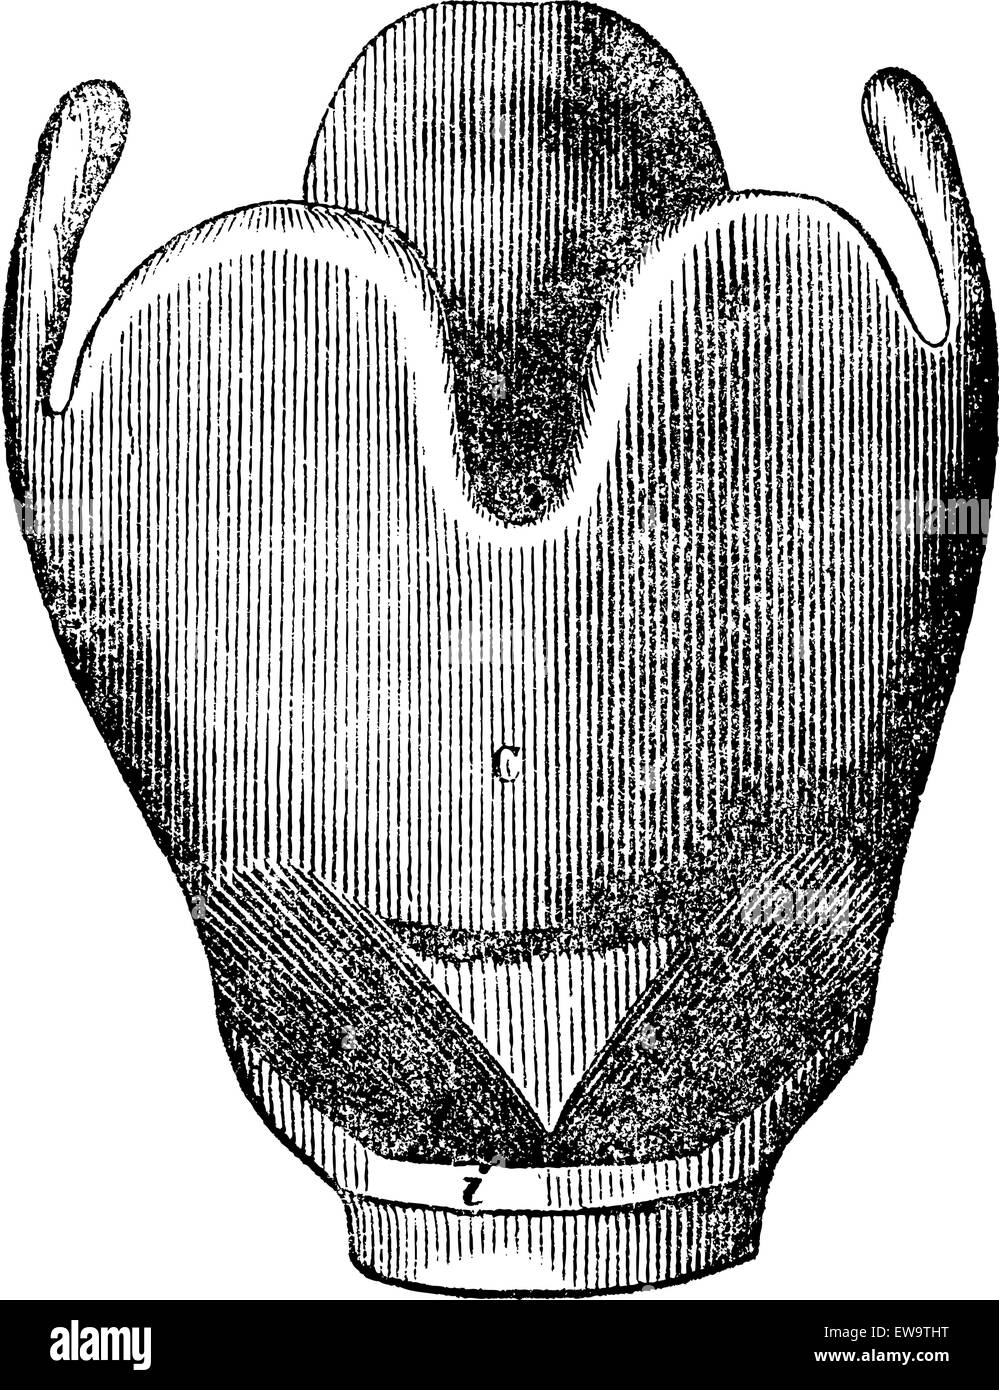 Larynx Phonation Stockfotos & Larynx Phonation Bilder - Alamy